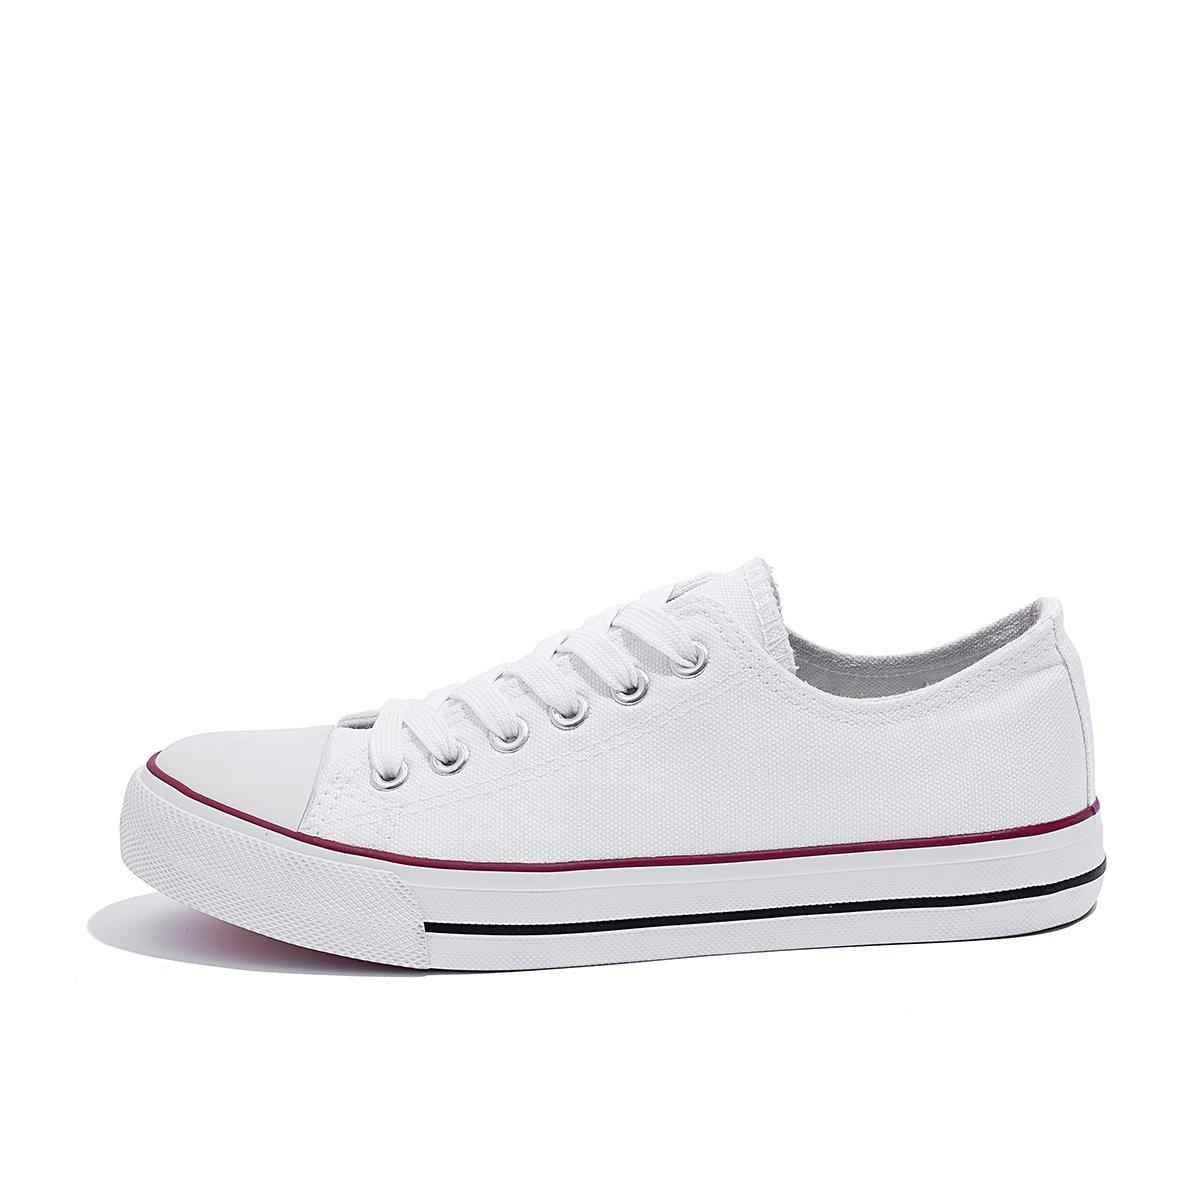 AOMAIS Womens Canvas Shoes Sneaker Low Top Lace up Fashion Walking Shoes (US7, white1) … by AOMAIS (Image #2)